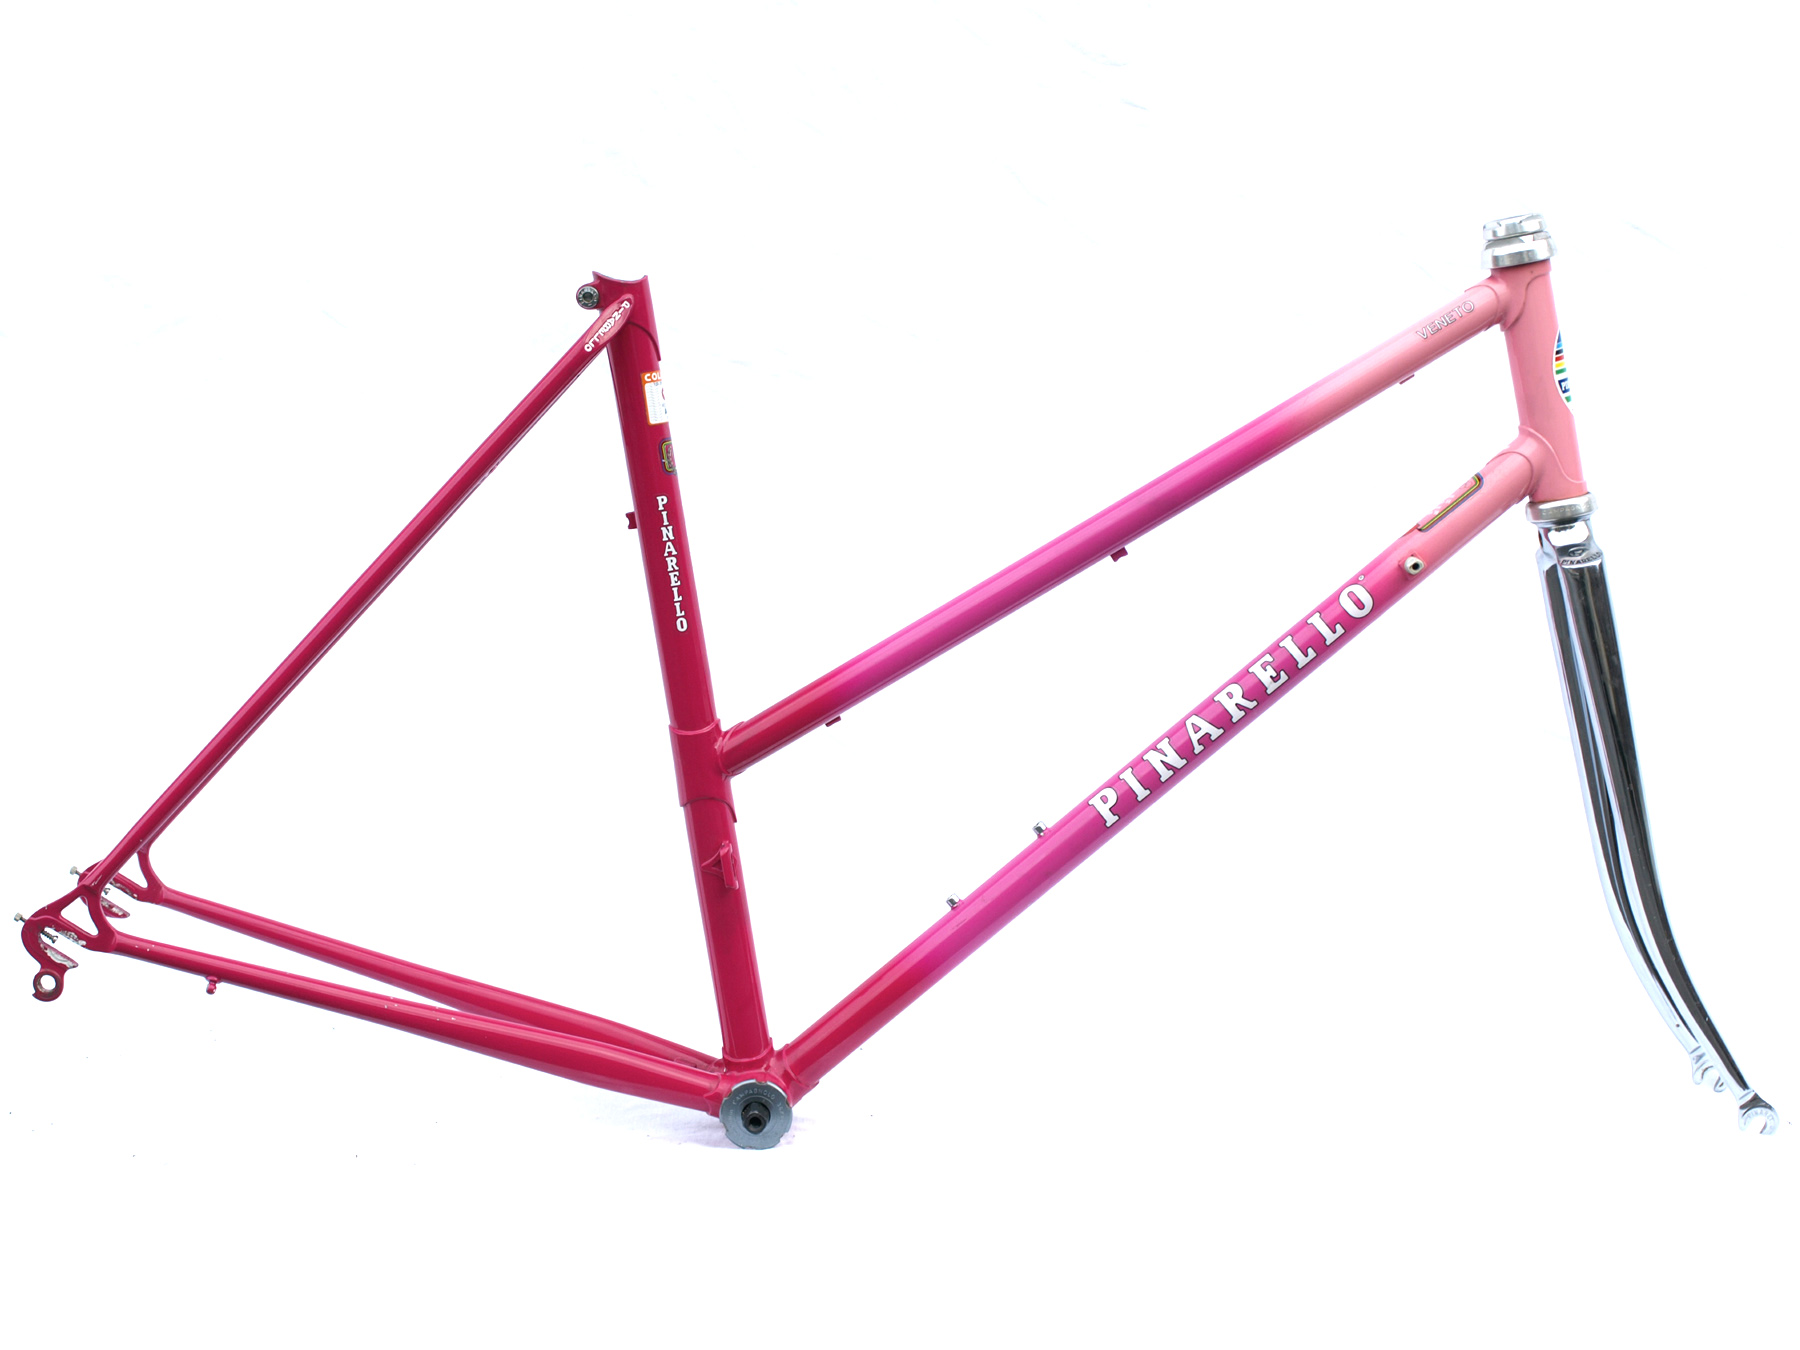 Velovilles | Vento 53 cm | Vintage bikes and bicycle parts